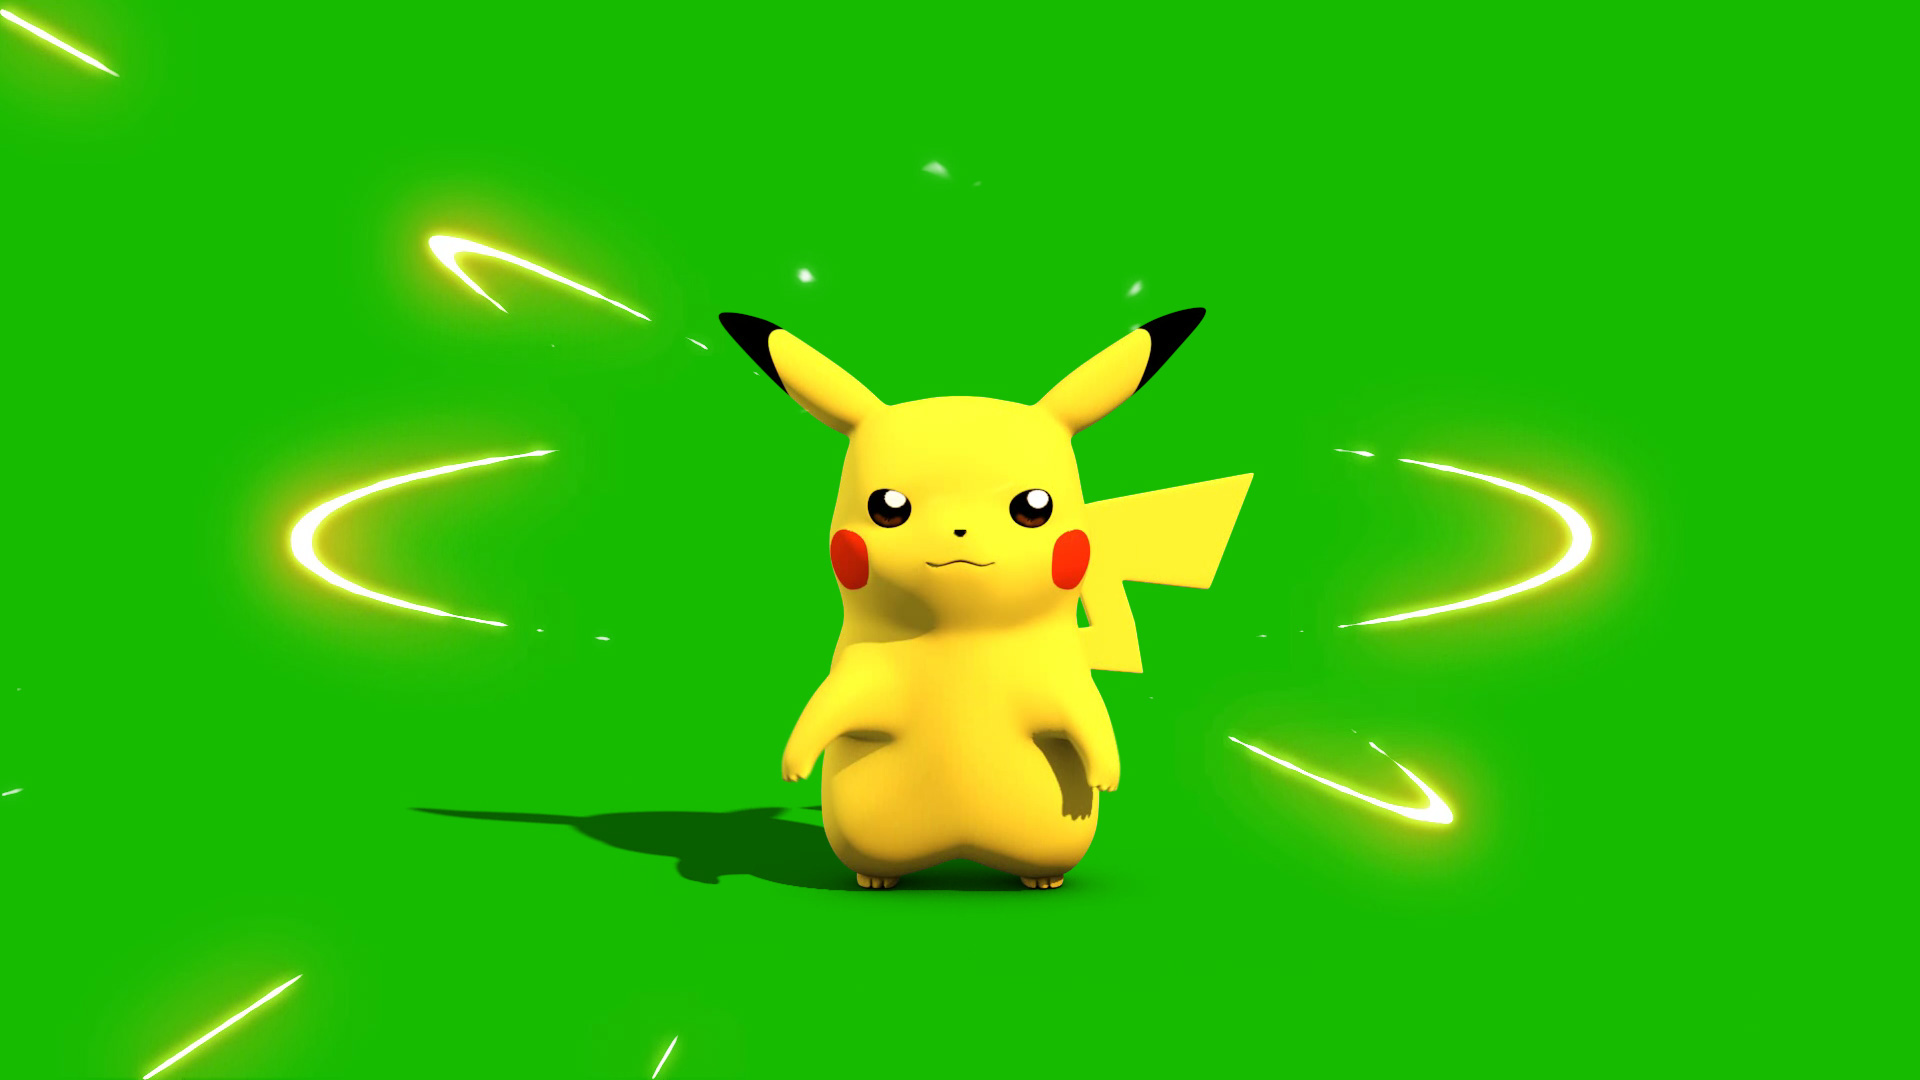 Pikachu Pokemon Go Images